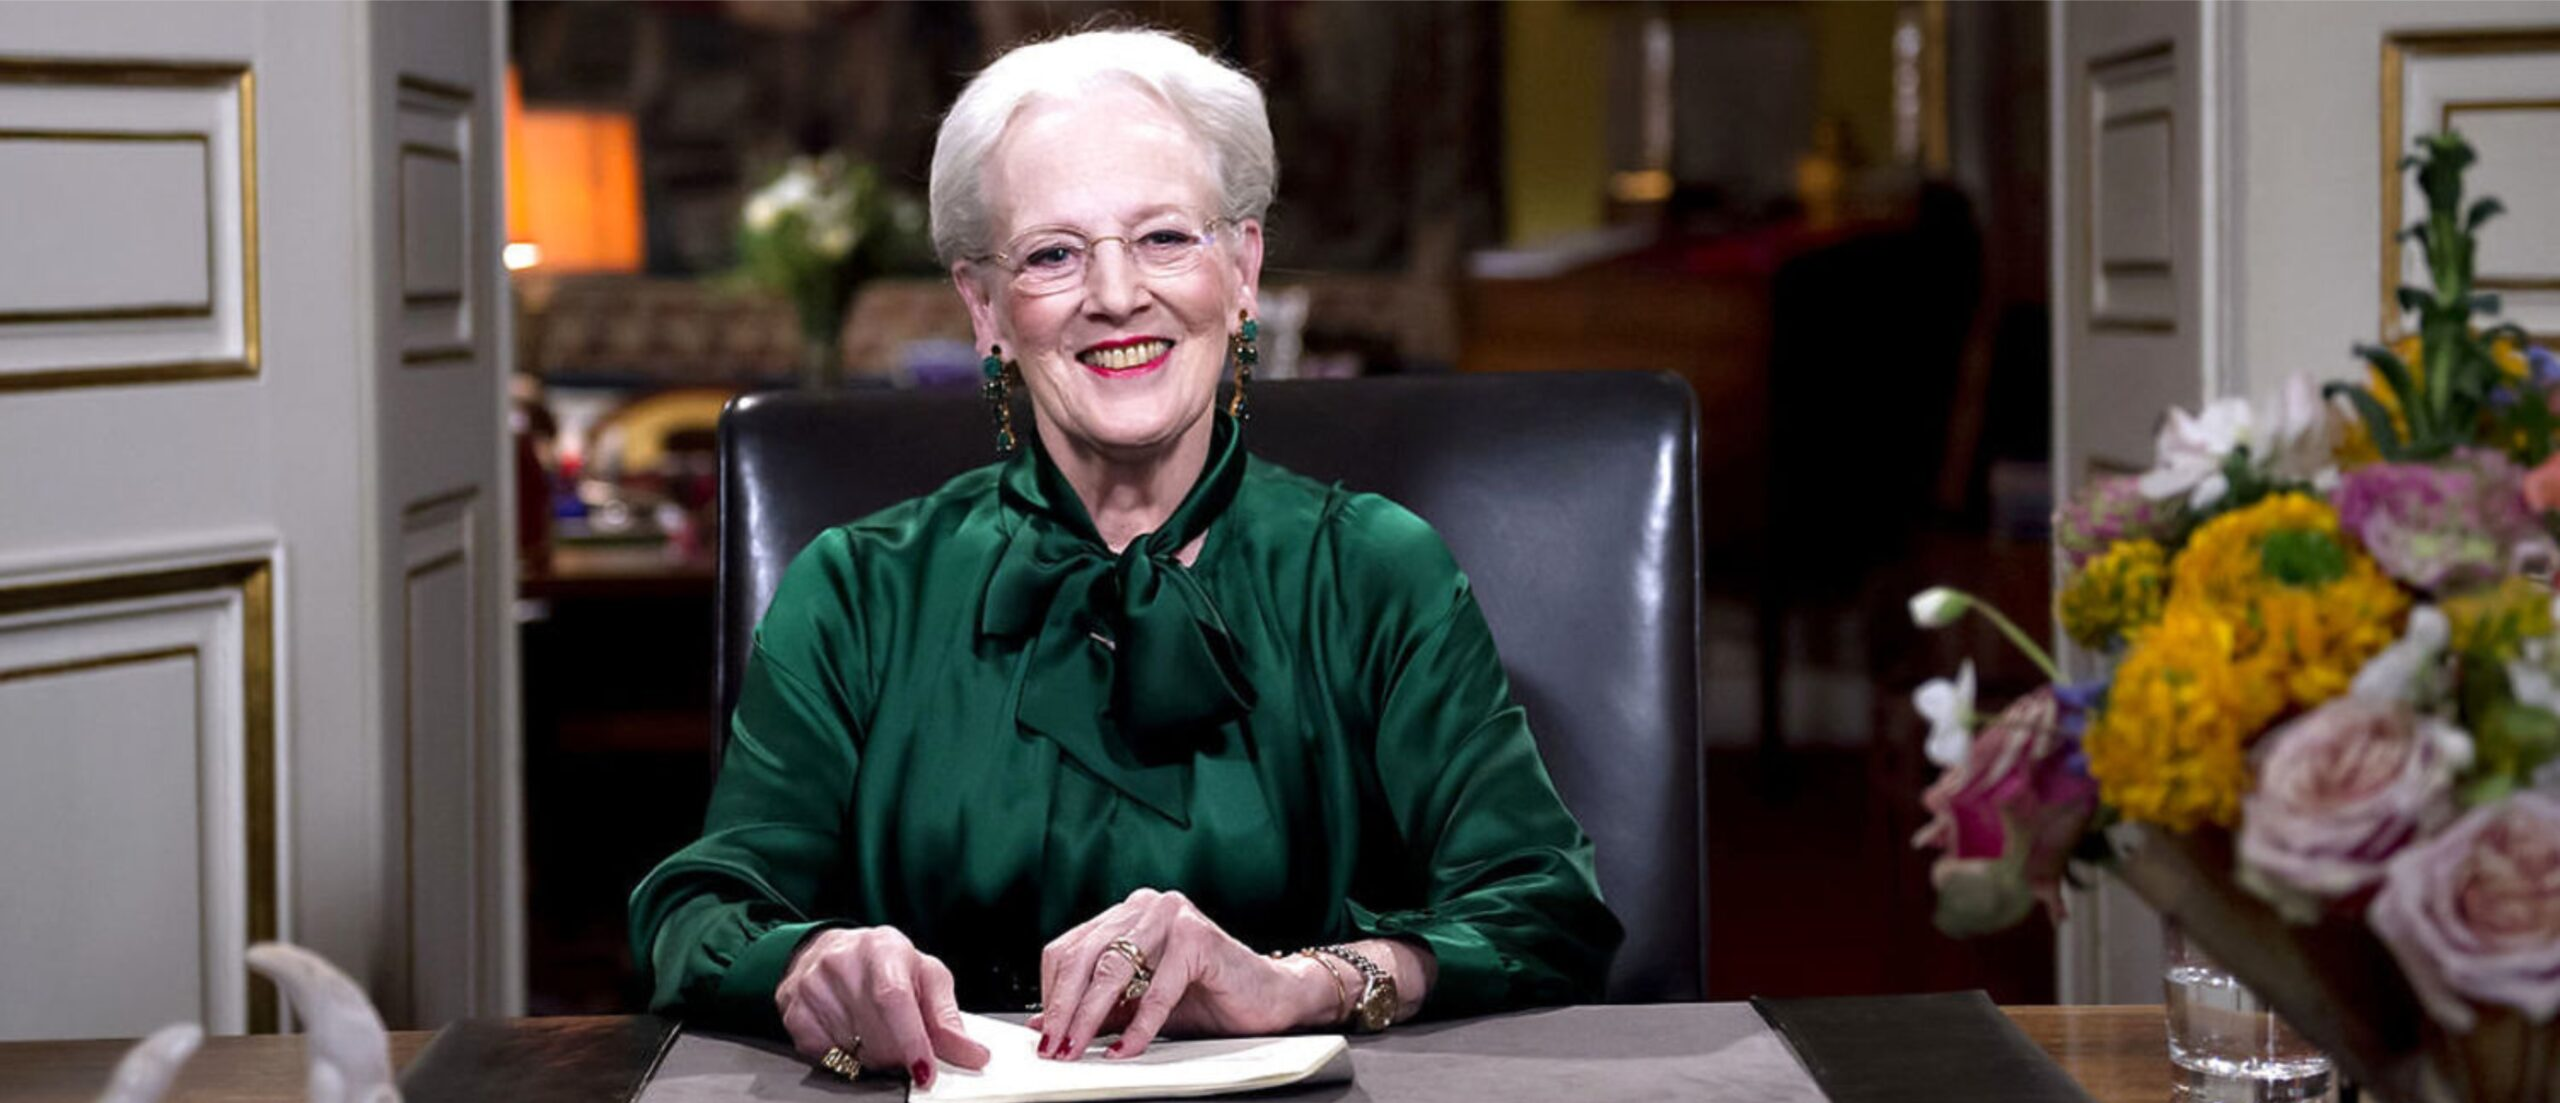 Queen Margrethe II of Denmark Will Be the Set Designer of a Netflix Film